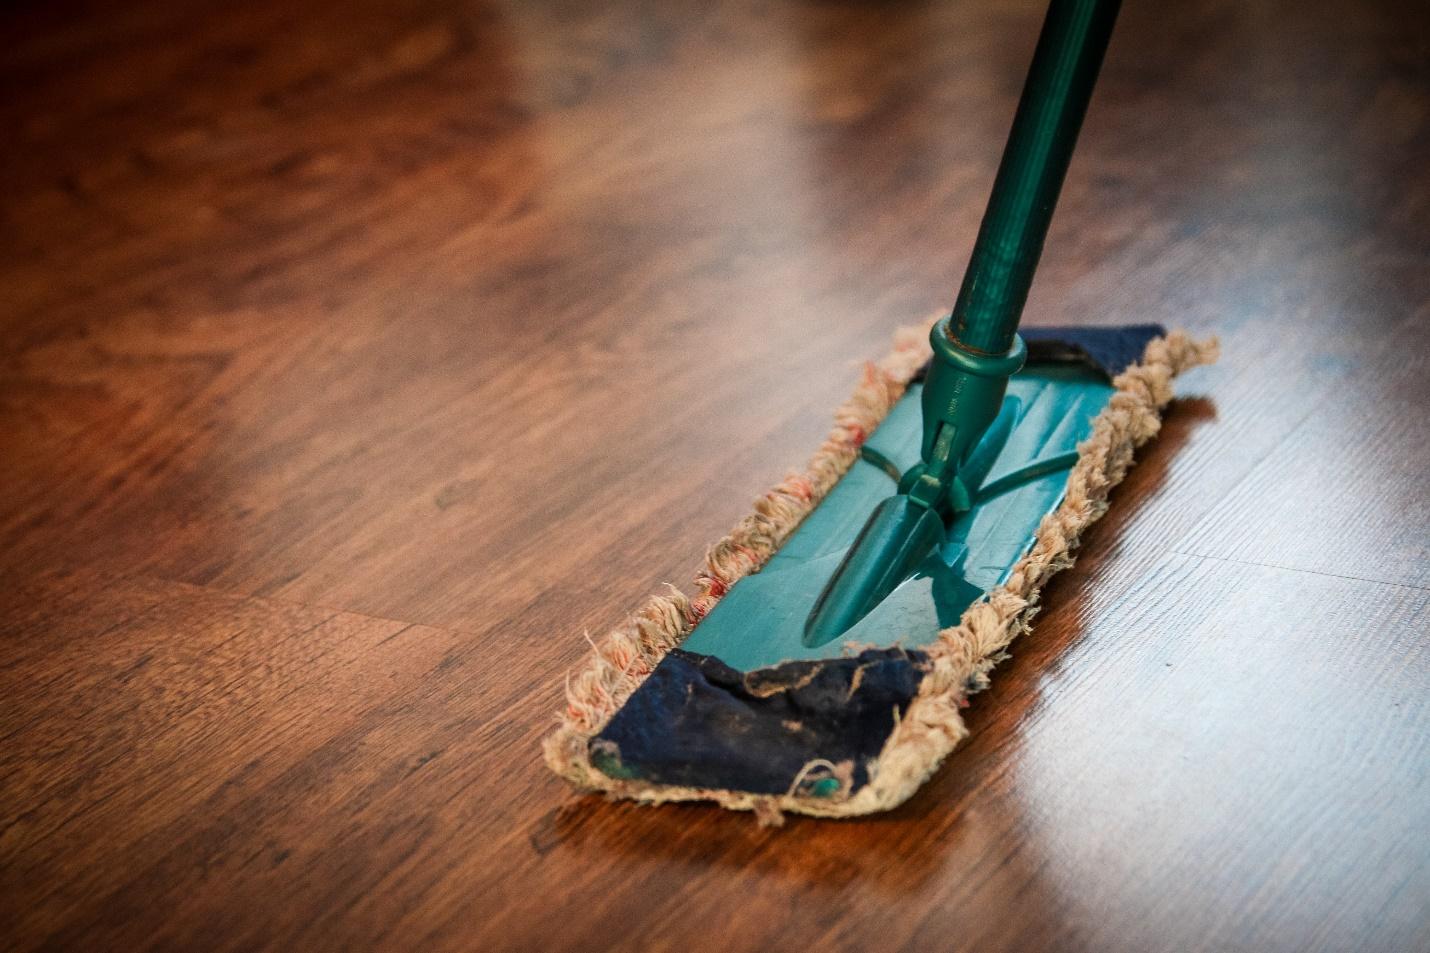 mopping hardwood floors